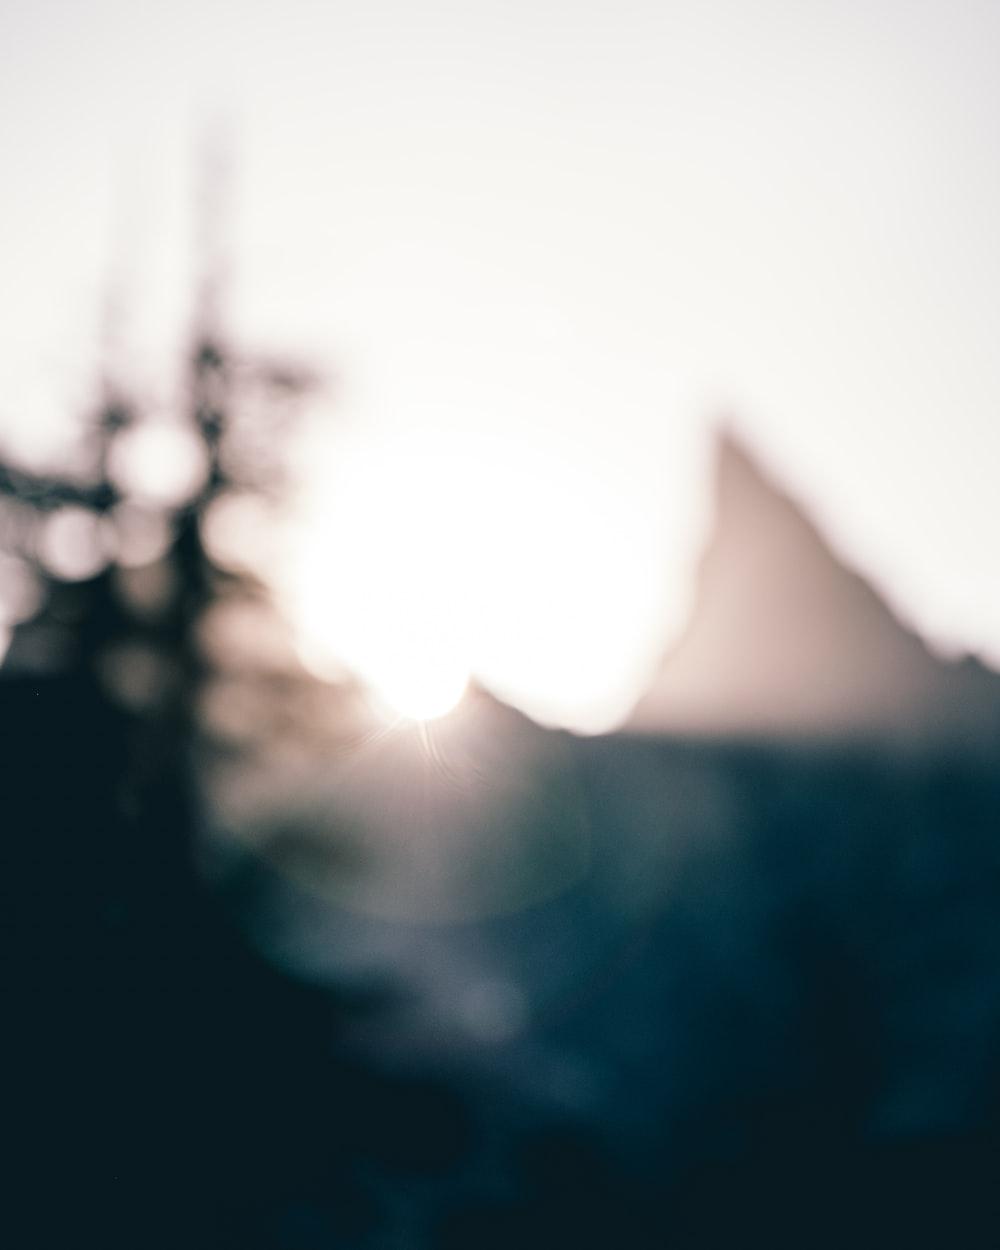 900+ Blur Background Images: Download ...